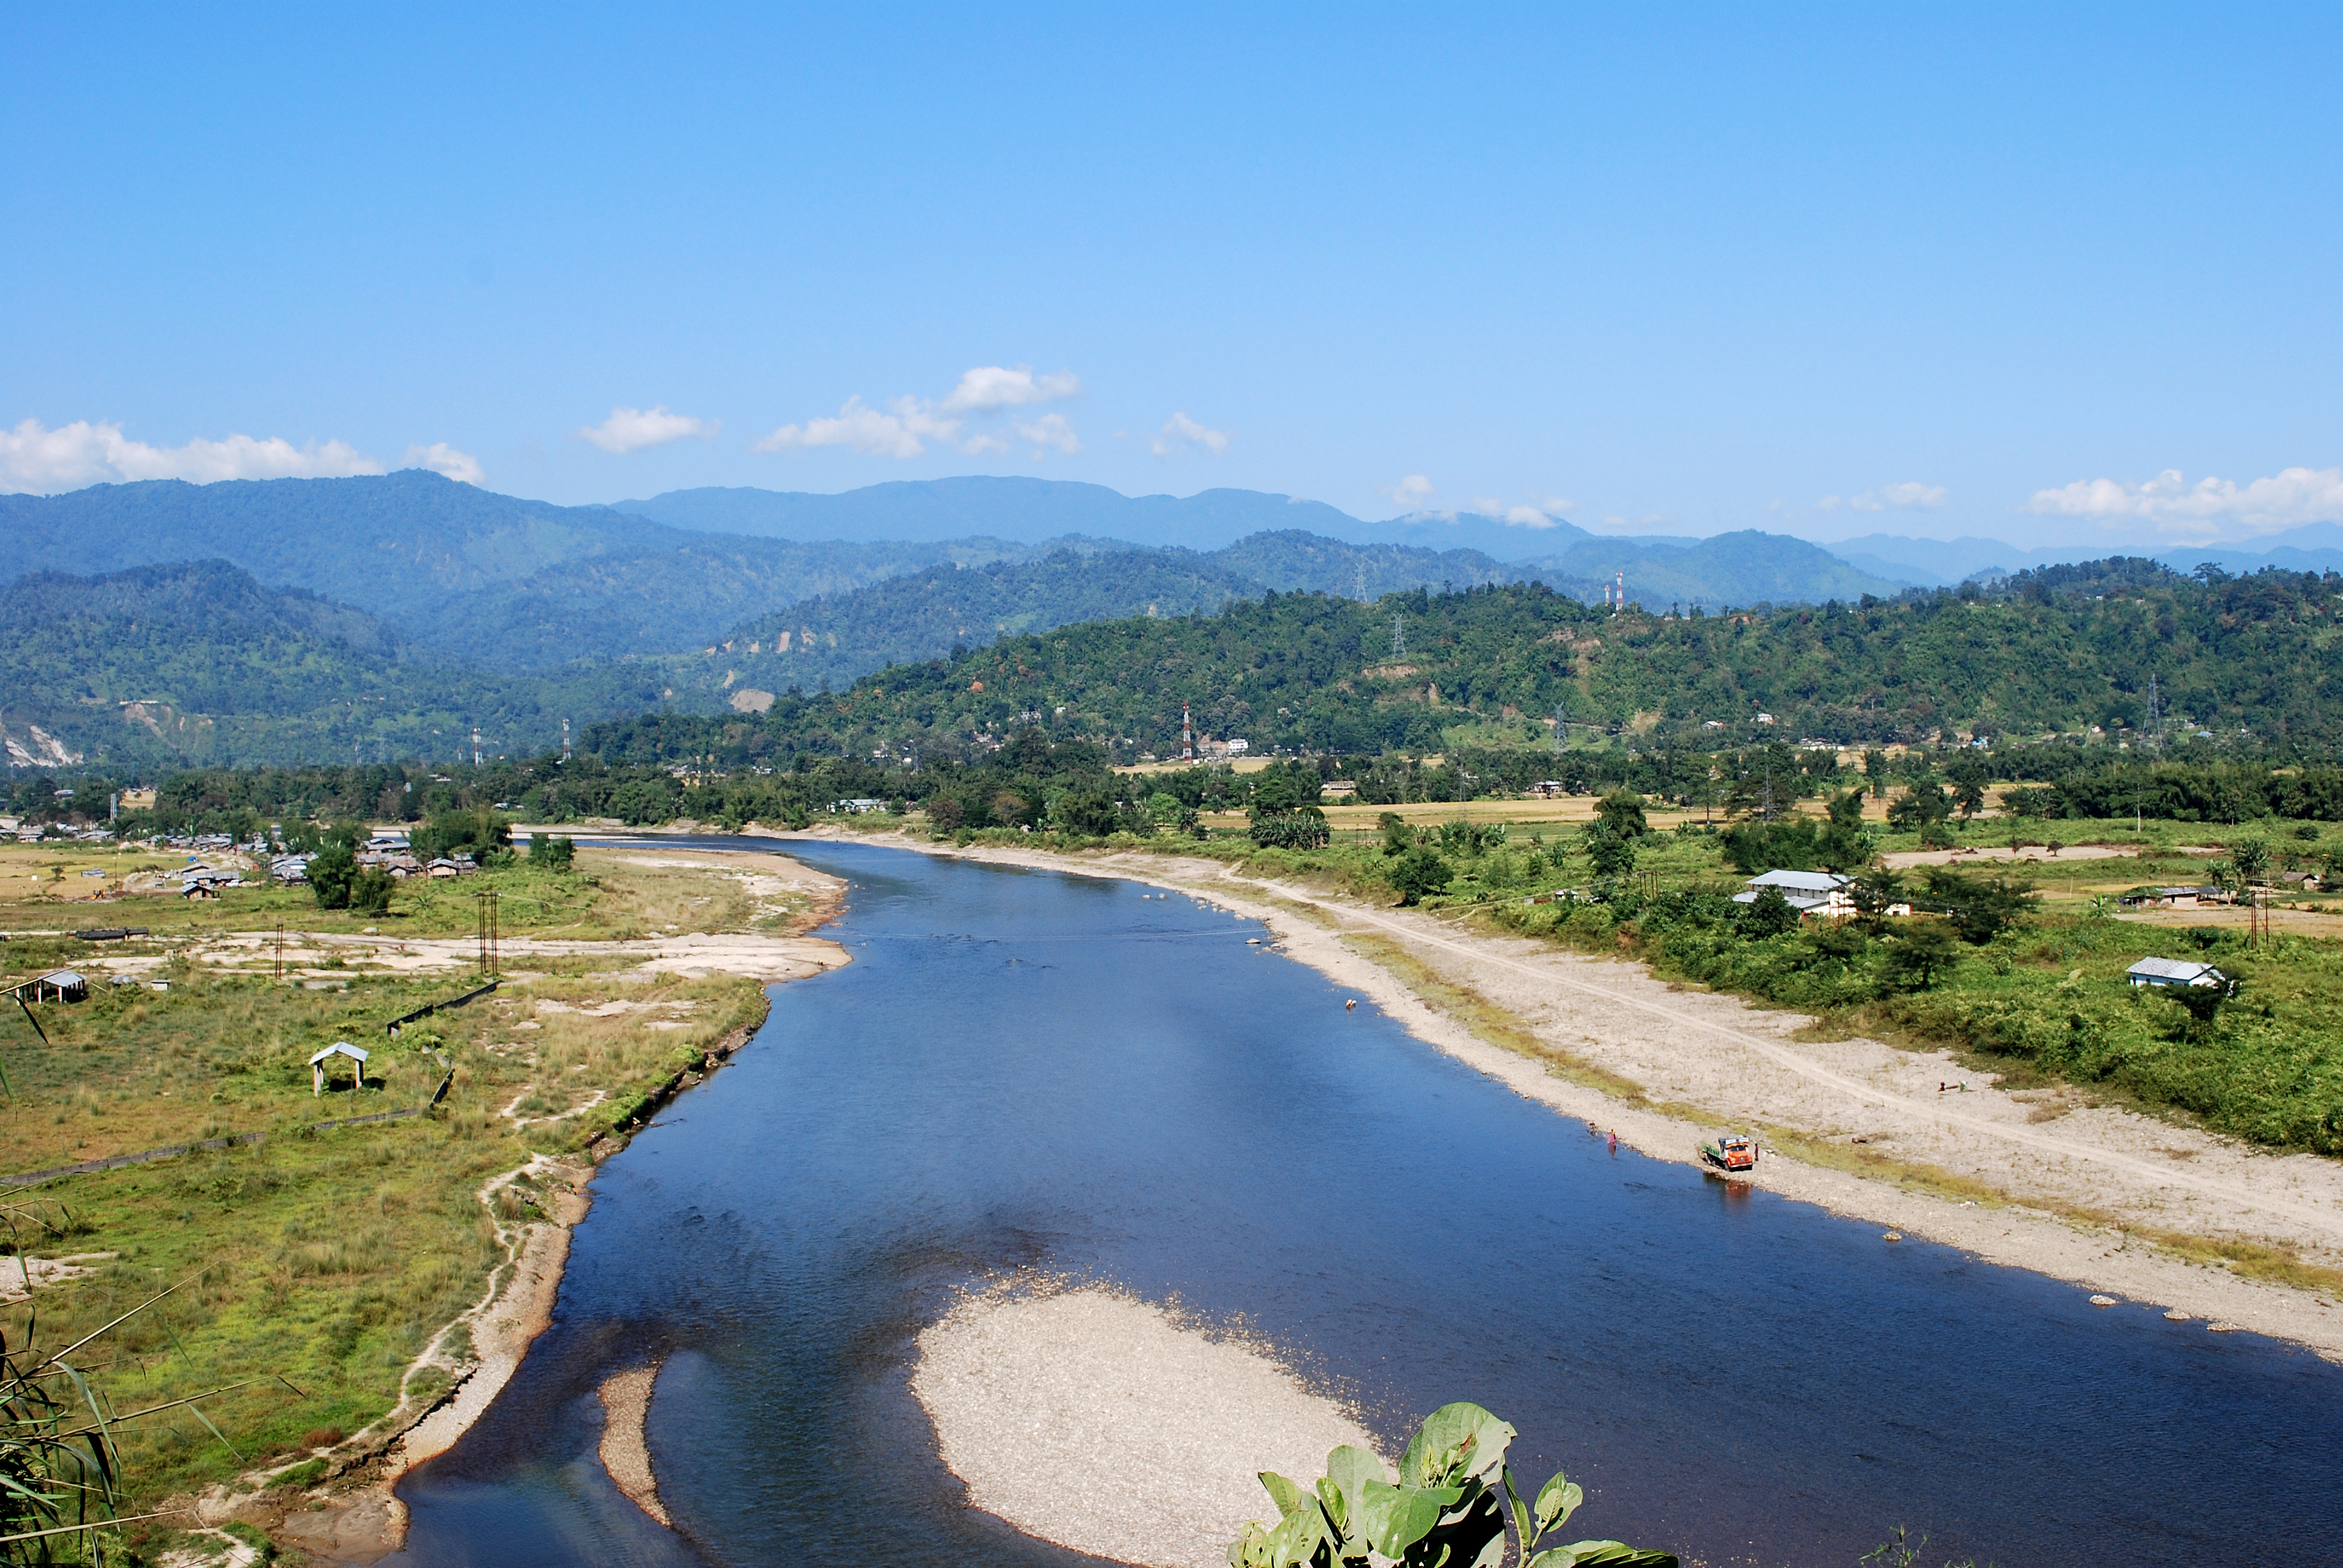 Dikrong_river_near_Itanagar